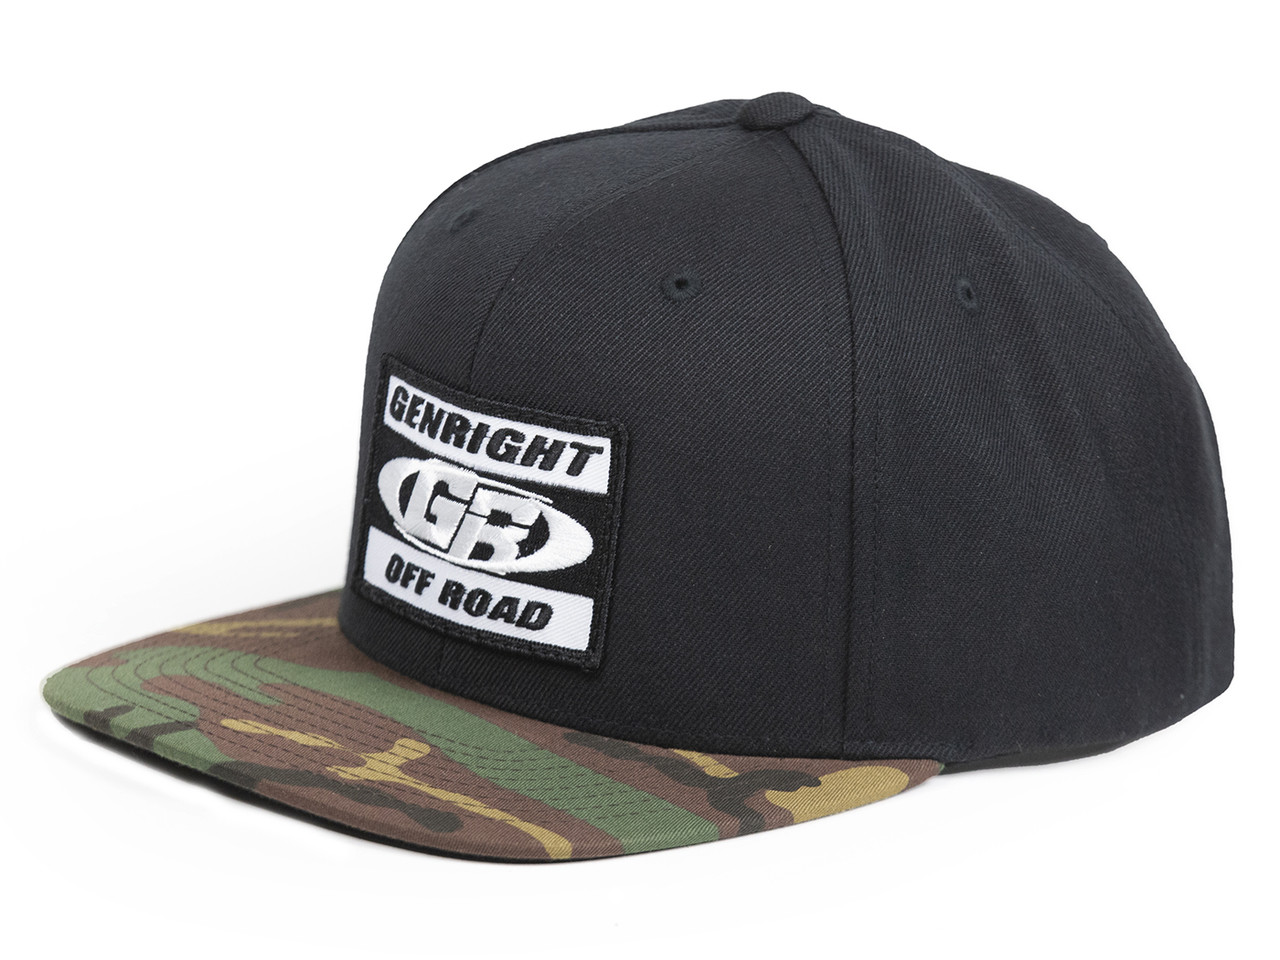 GenRight 2-Tone Camo Snapback Hat